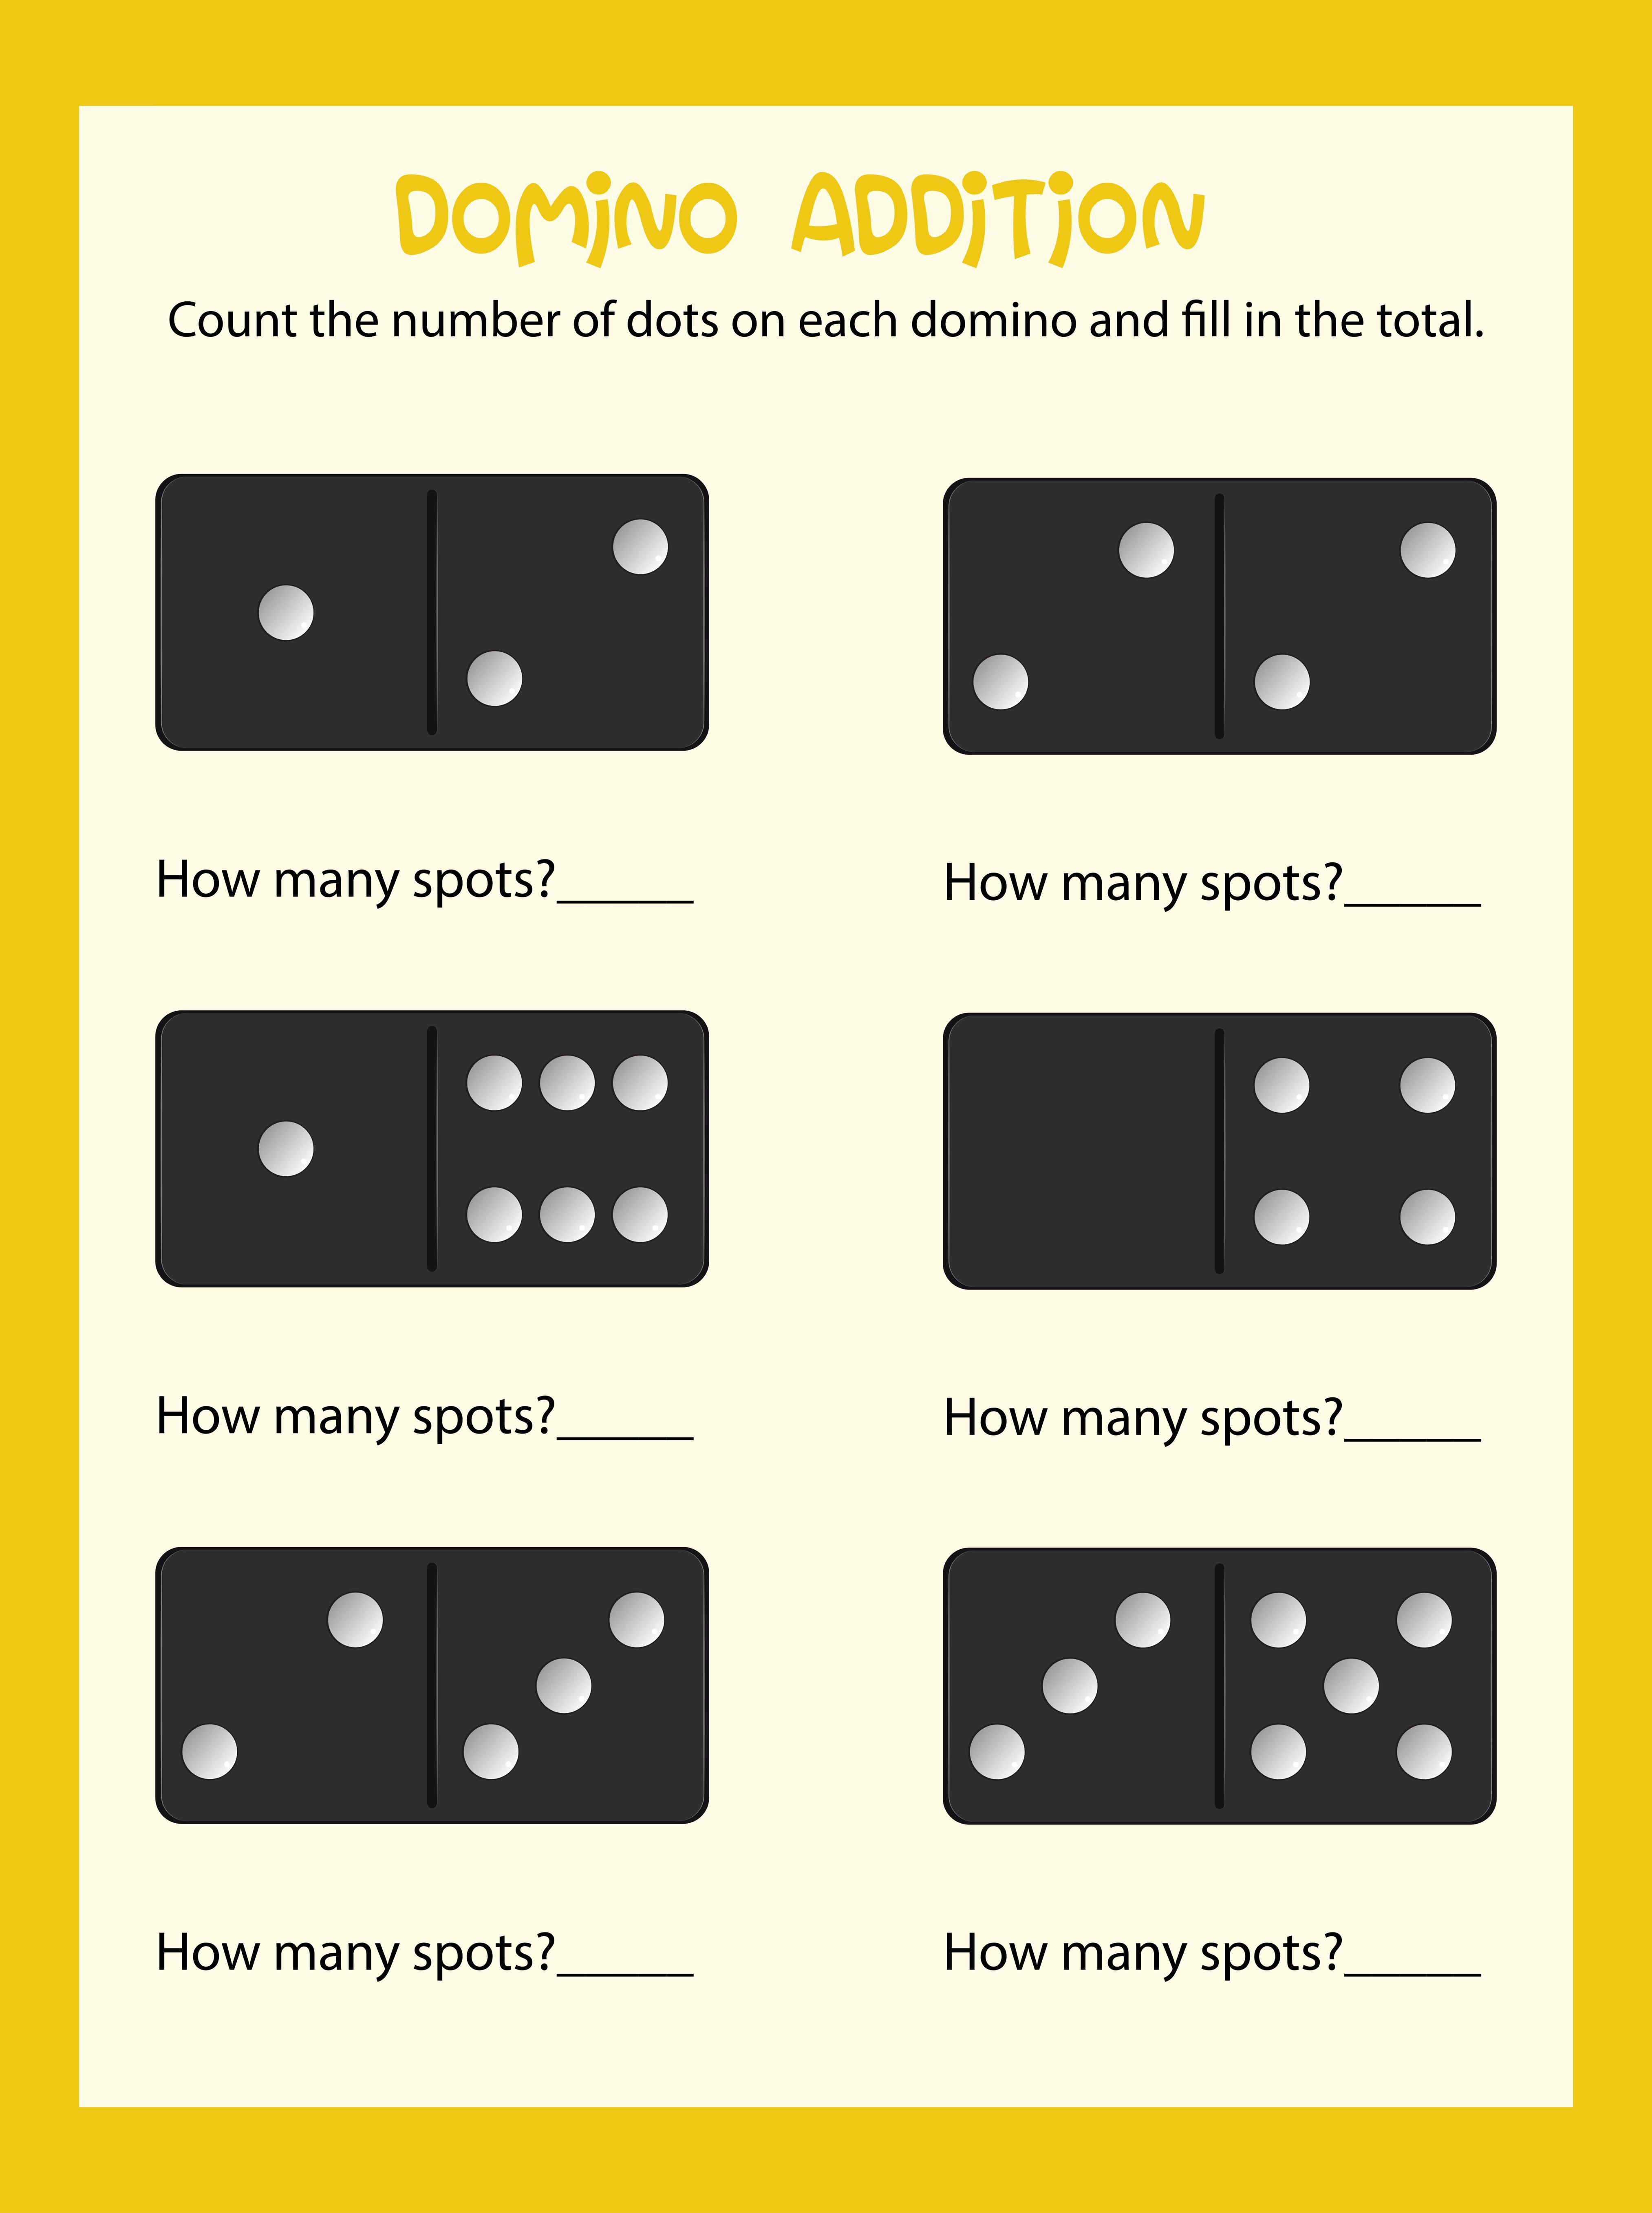 Domino Counting Math Worksheet